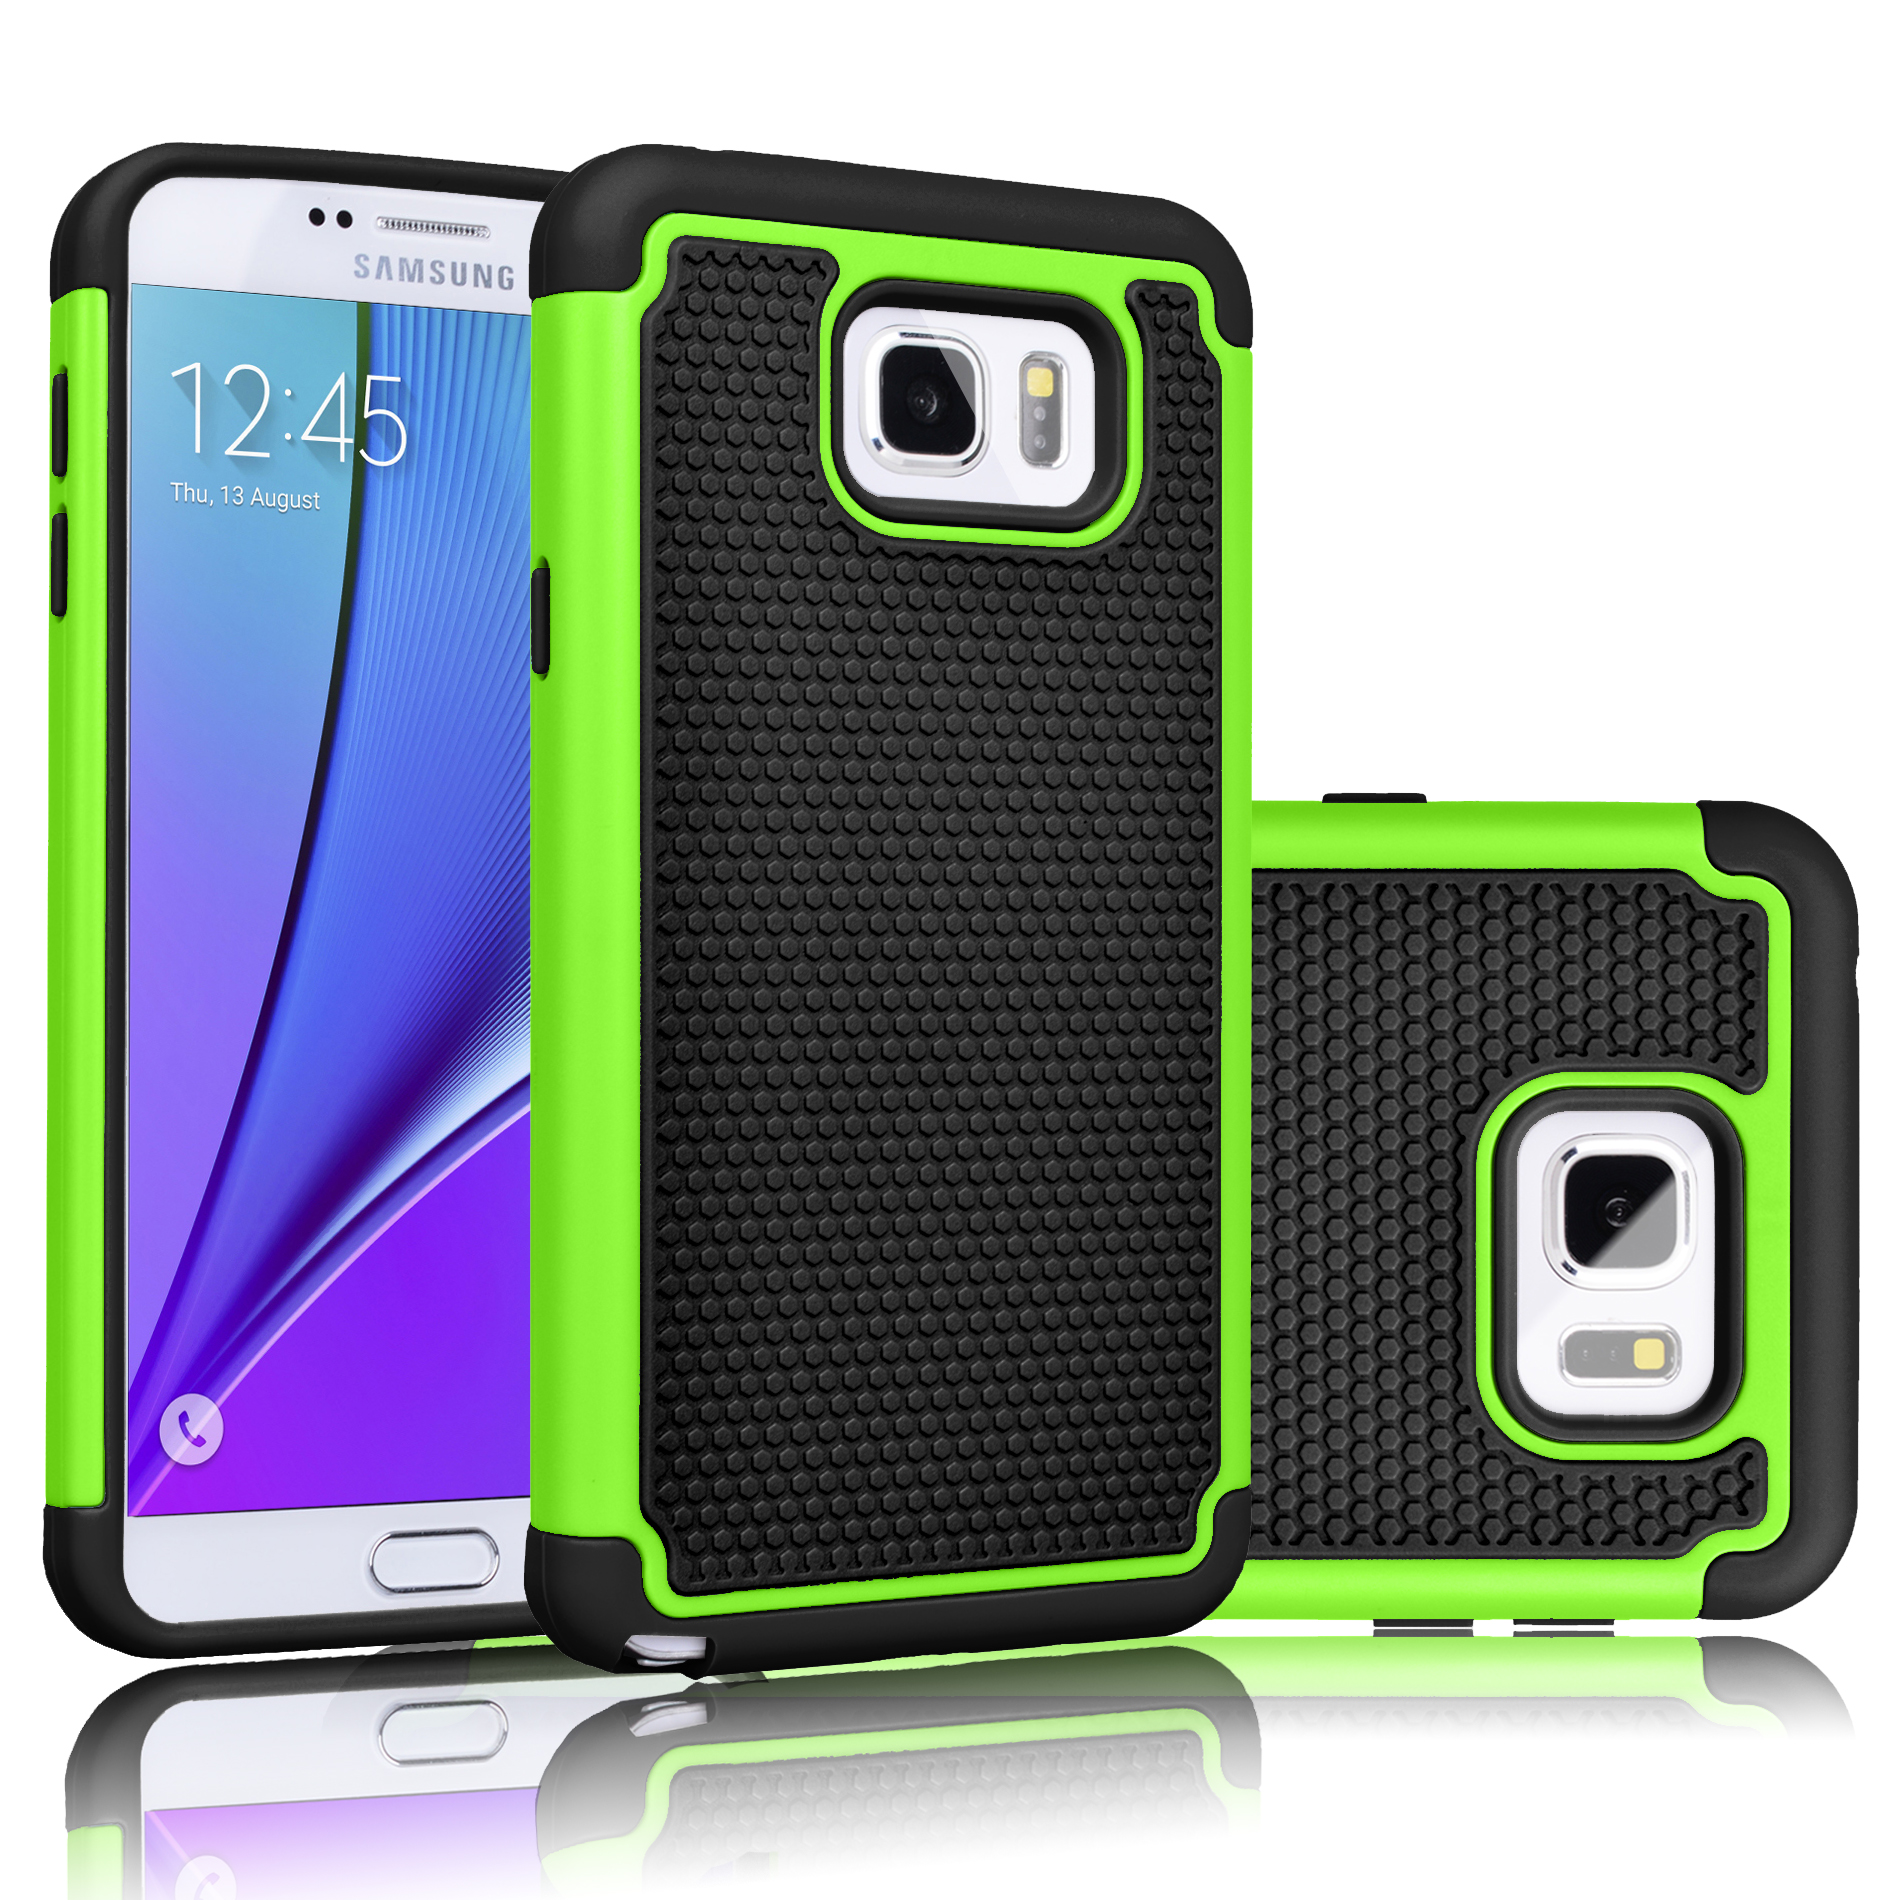 Galaxy Note 5 Case, Case Cover, Tekcoo [Tmajor] [Green Cases